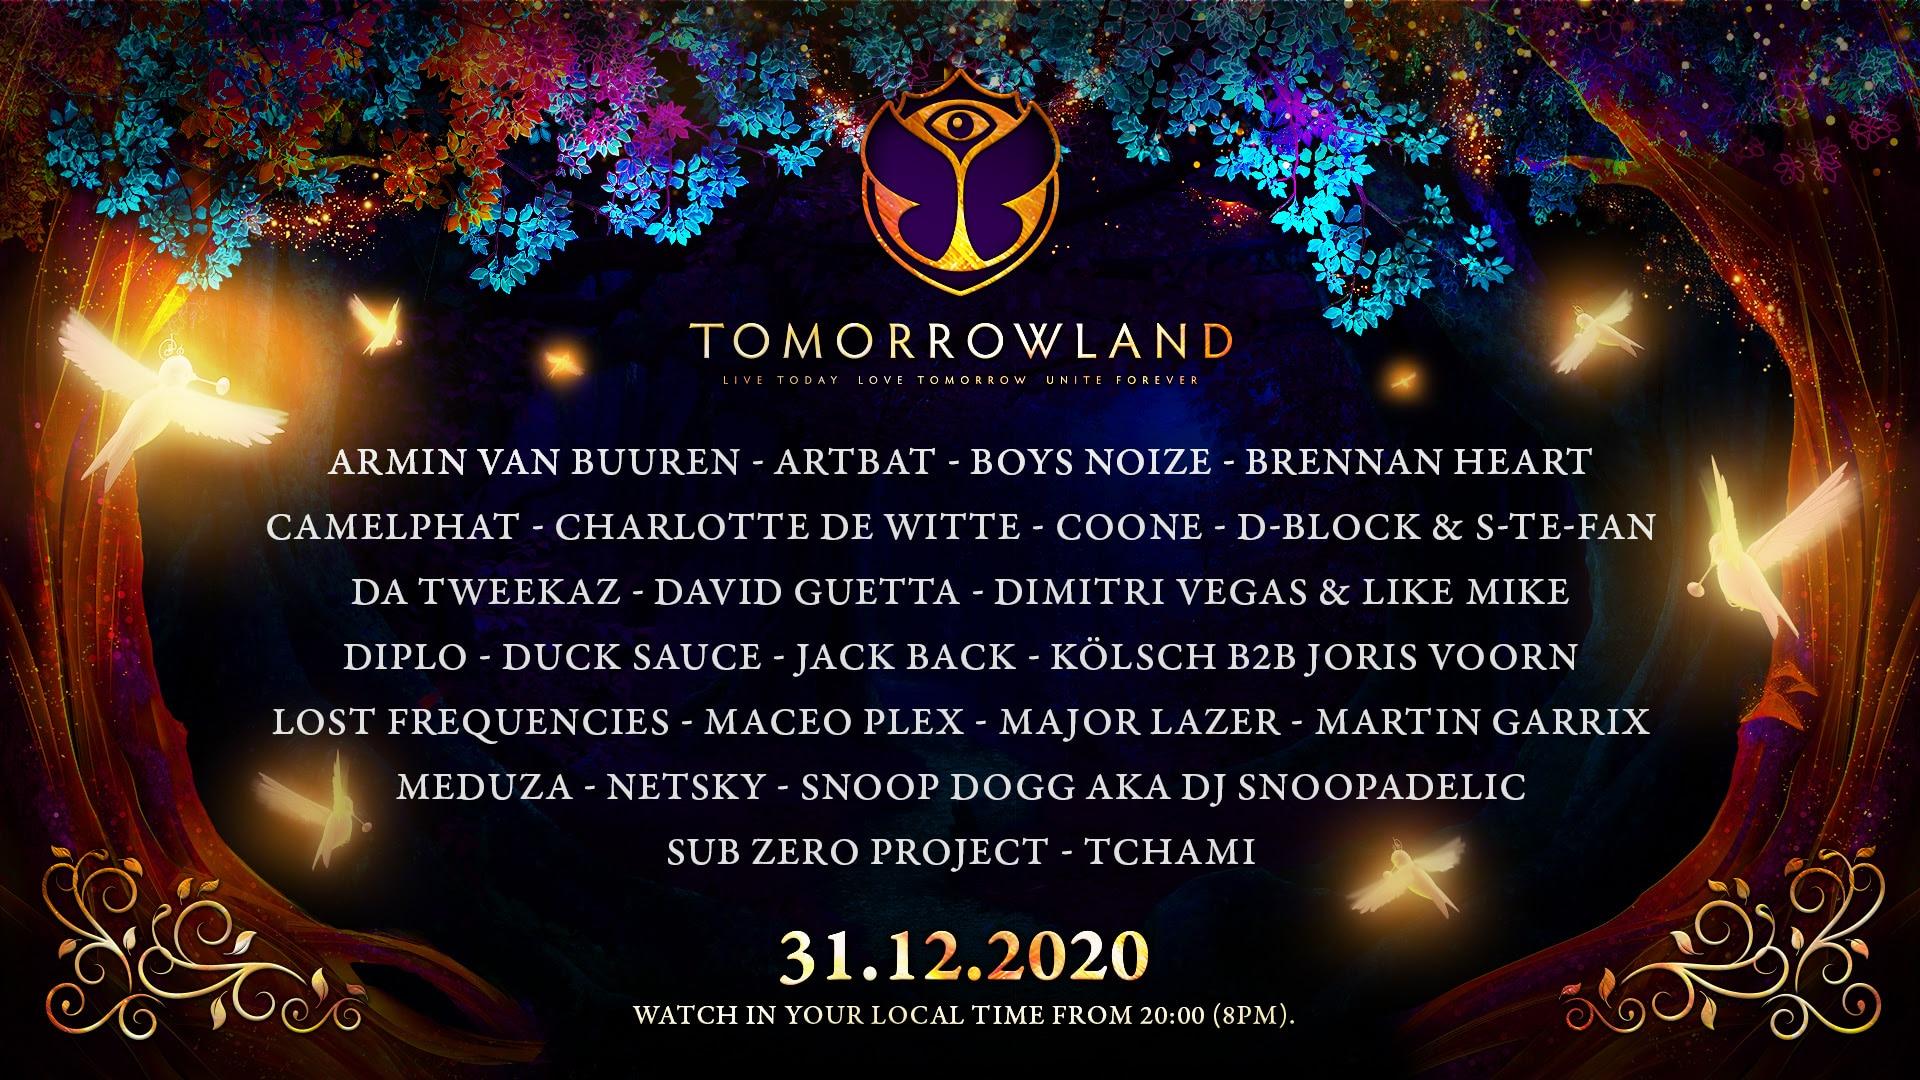 Oudejaarsfeest Tomorrowland 31.12.2020